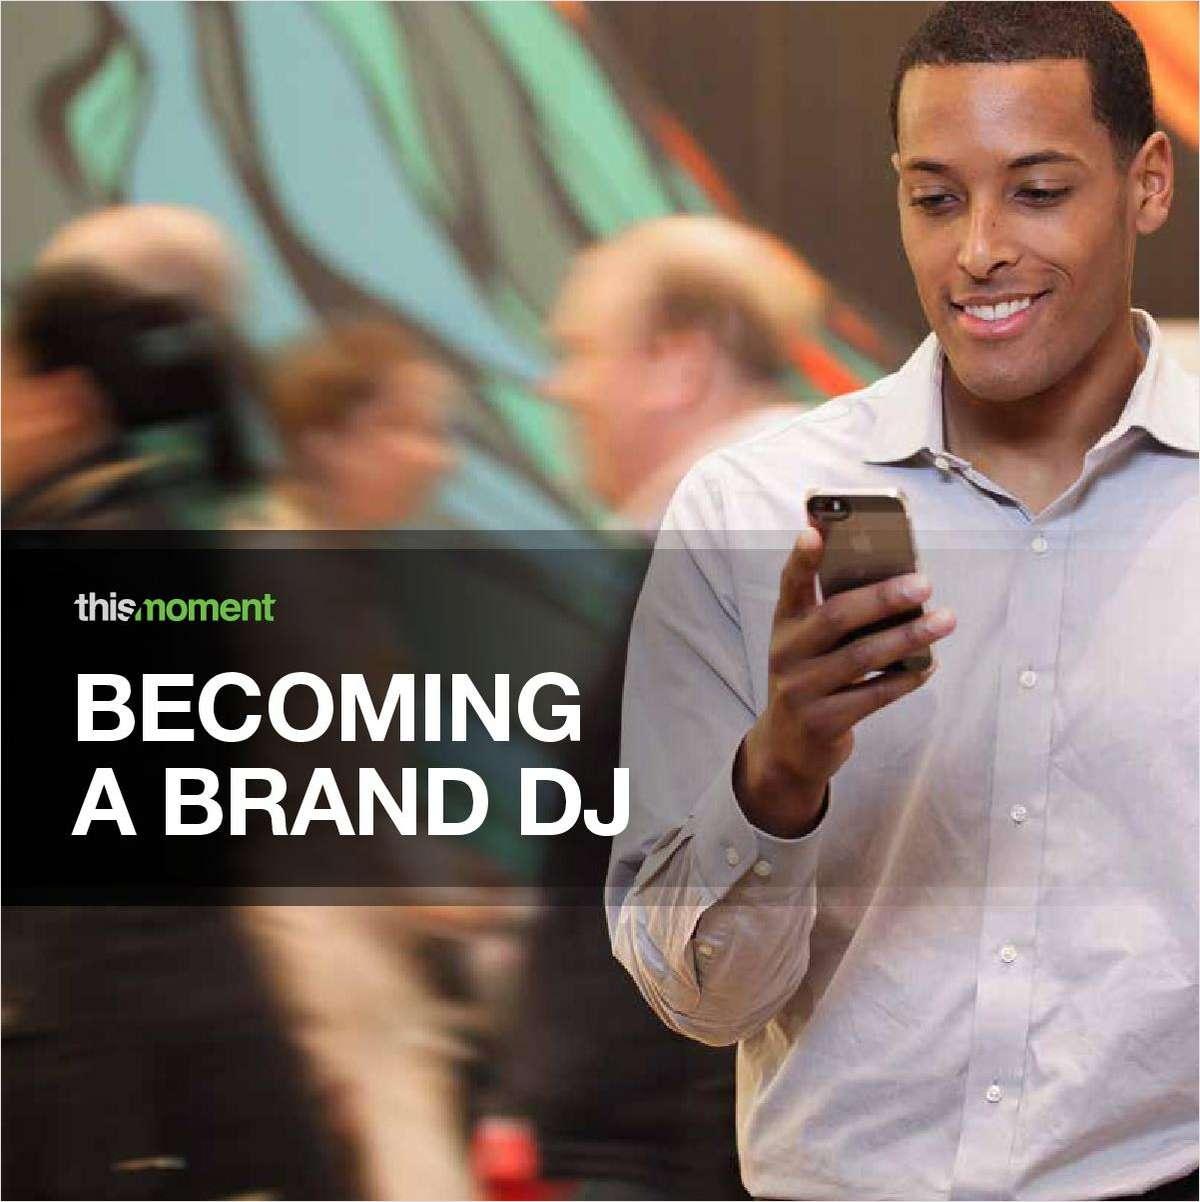 Becoming a Brand DJ